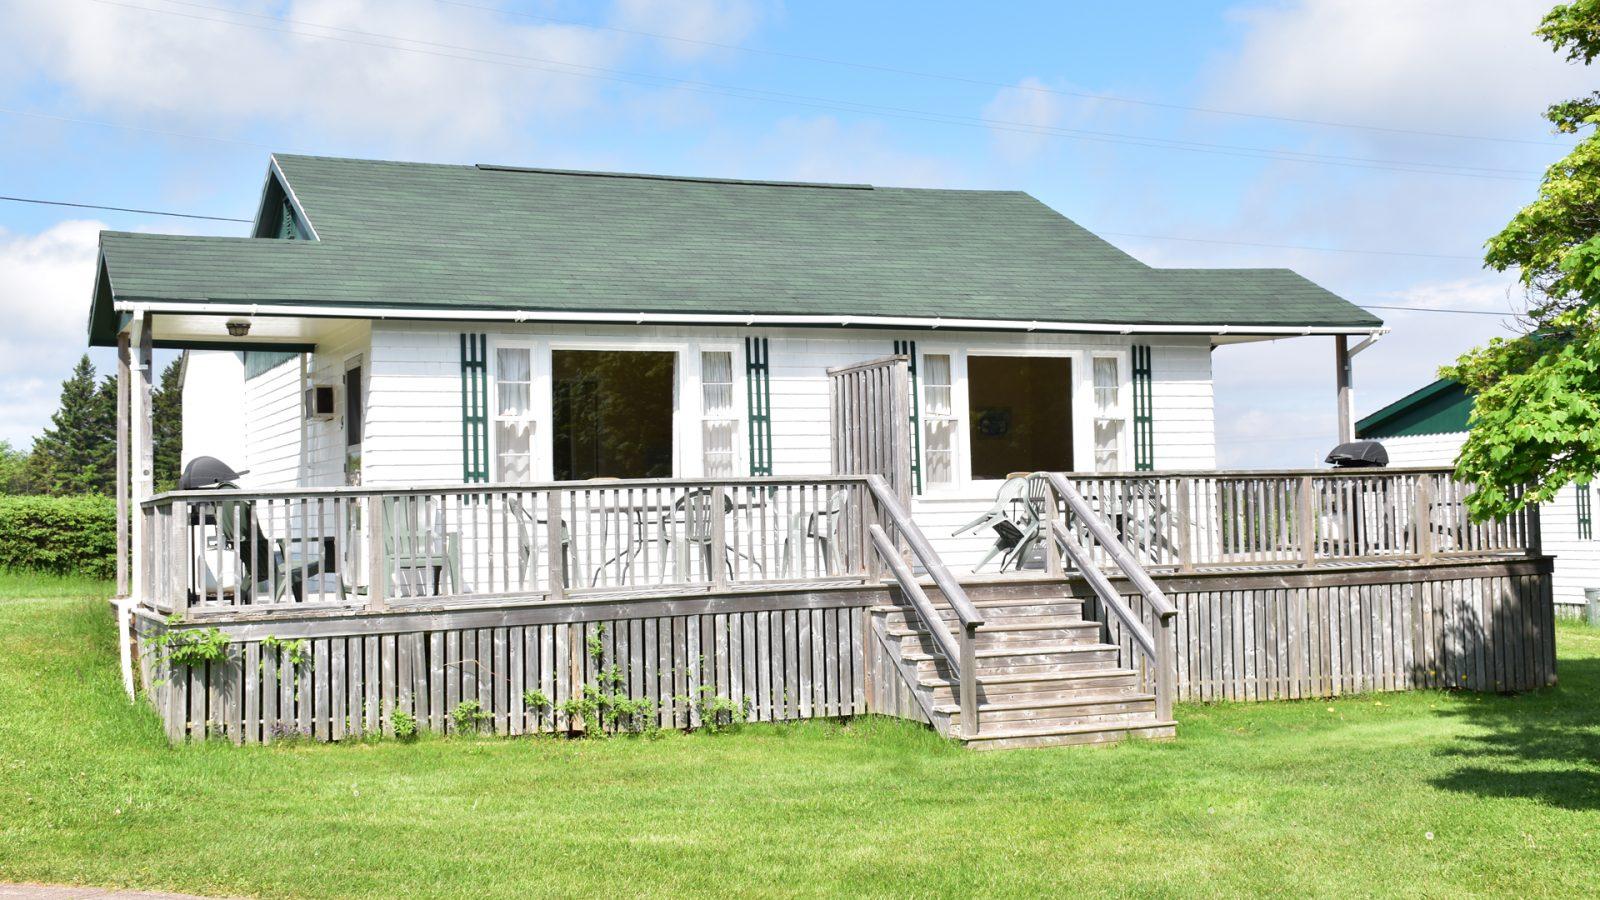 #8 Duplex Cottage - Exterior